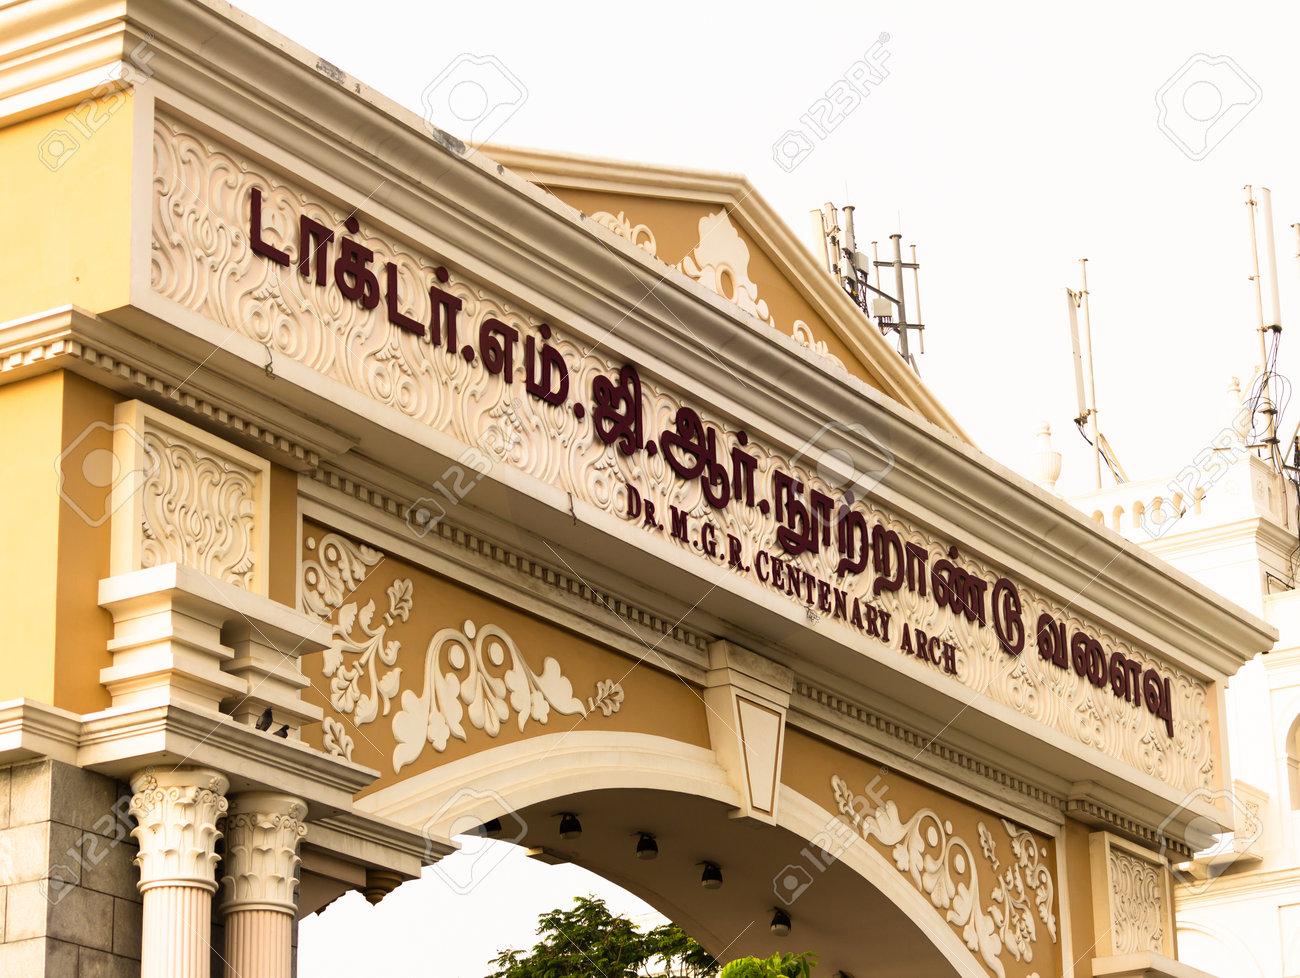 Chennai, Tamil Nadu, India - January 13 2021: View of the DR MGR Centenary Arch along Marina Beach, Chennai, Tamil Nadu, India - 164925051